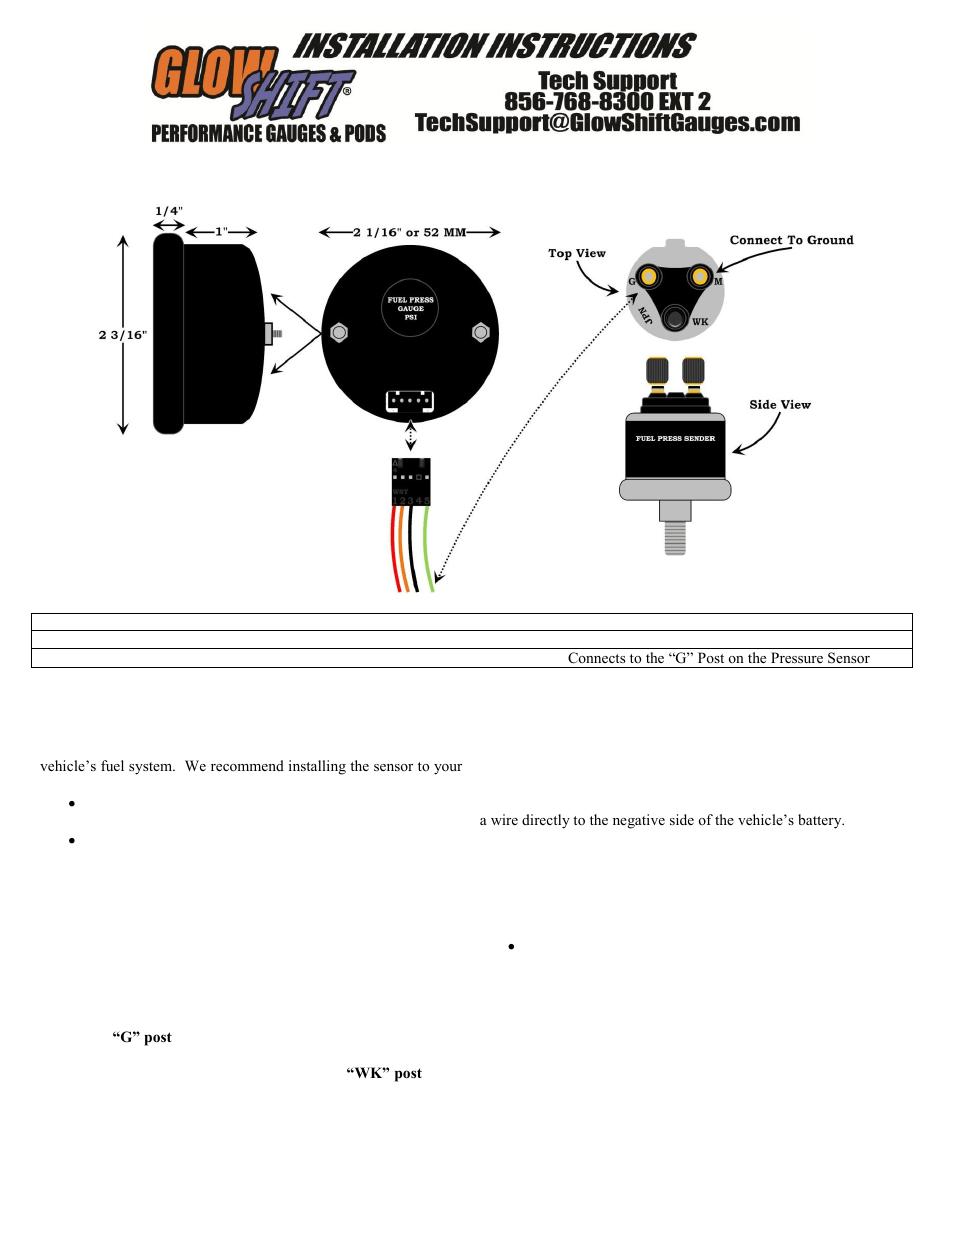 glowshift digital series fuel pressure gauge page1?resize\\\=665%2C861 glow shift boost gauge wiring diagram glow shift oil pressure  at eliteediting.co